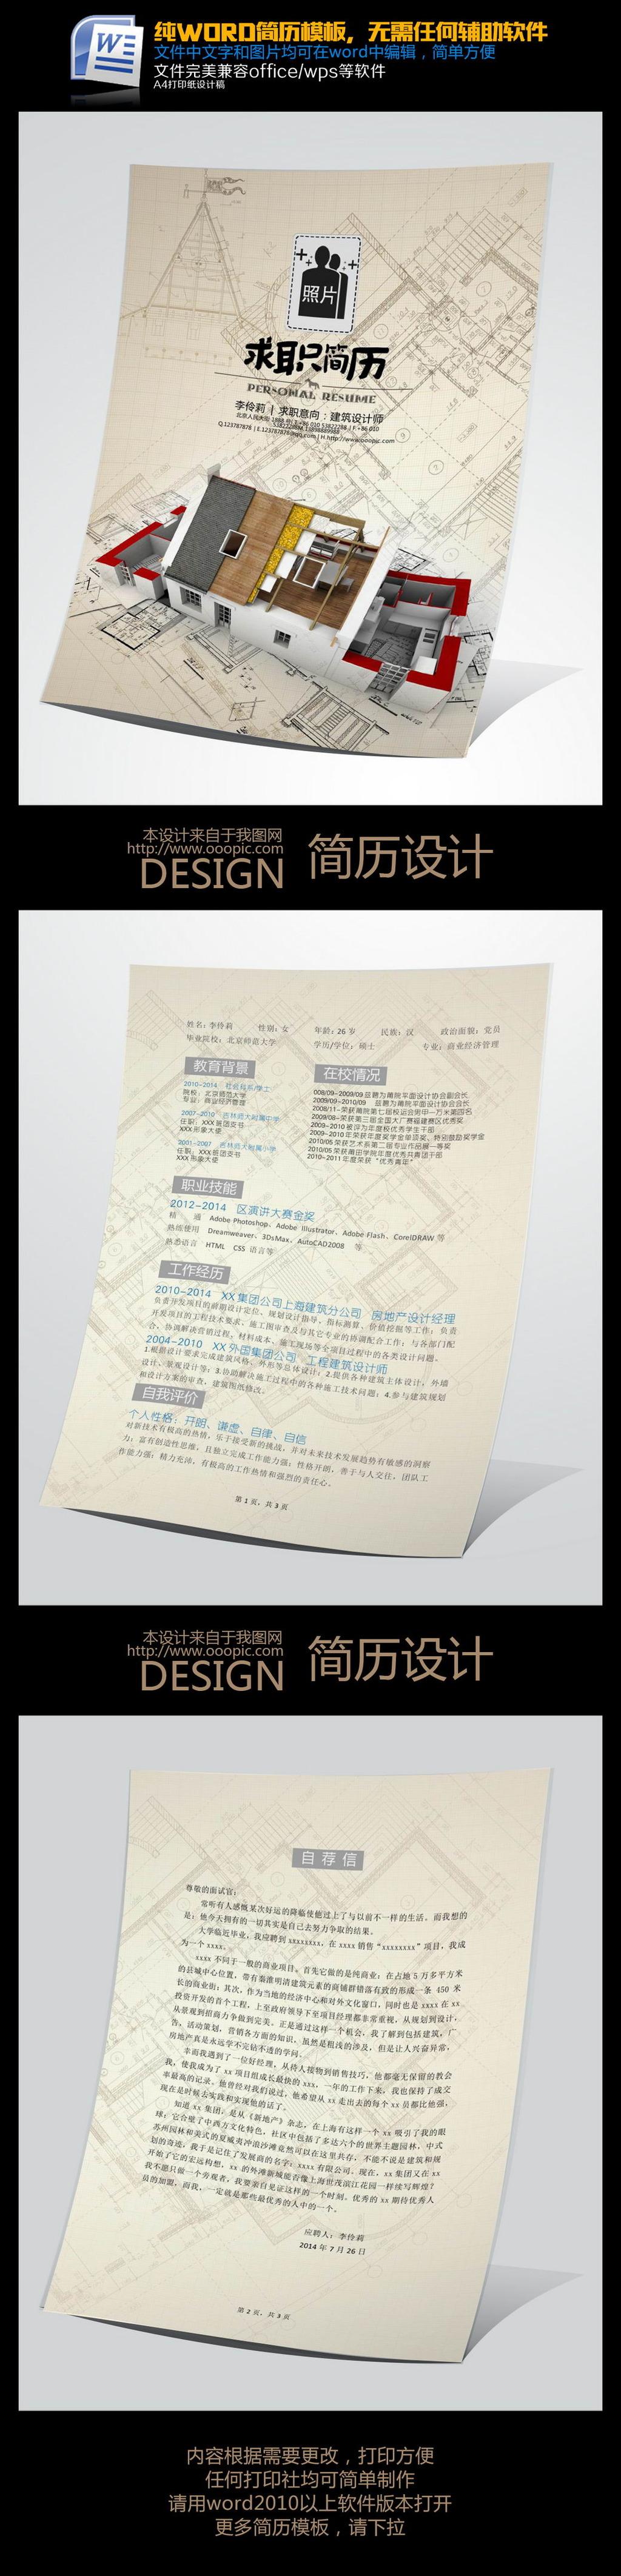 3pword建筑工程师地产设计简历模板下载(图片编号:)